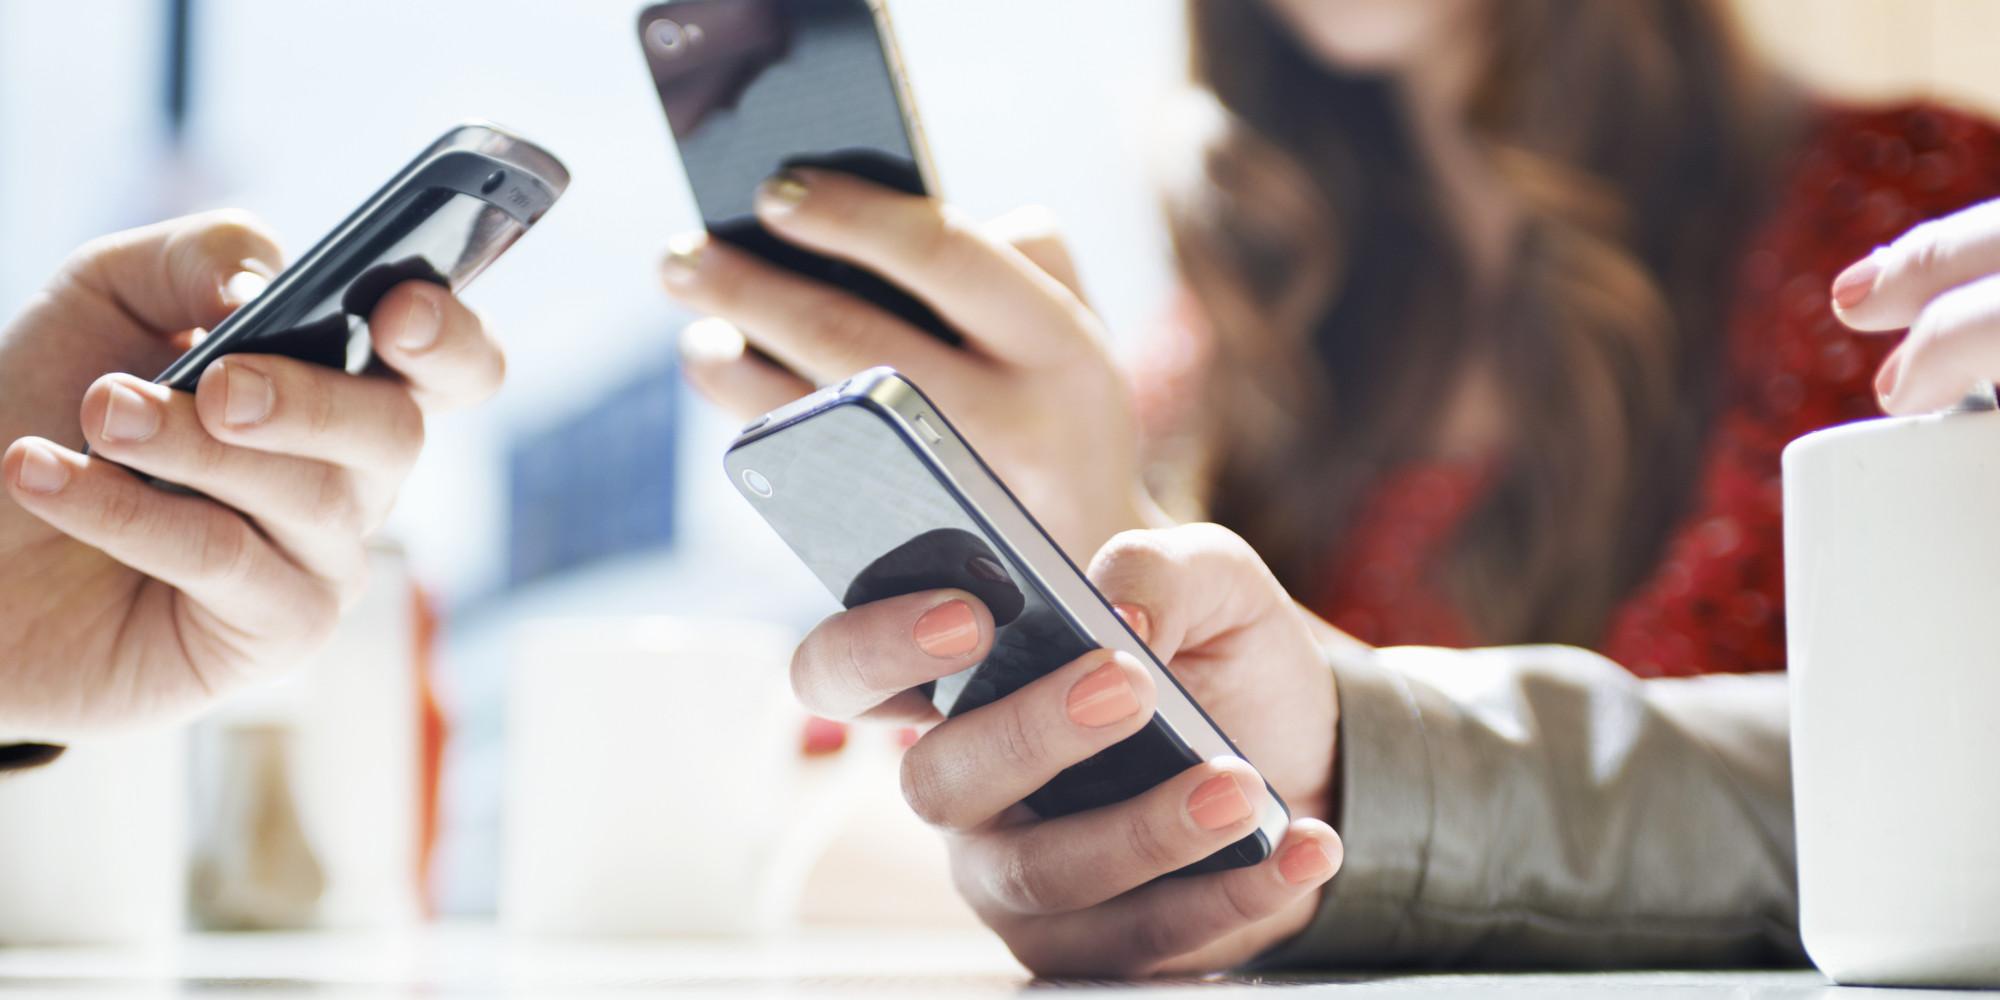 Piata de smartphone-uri este in crestere in 2016